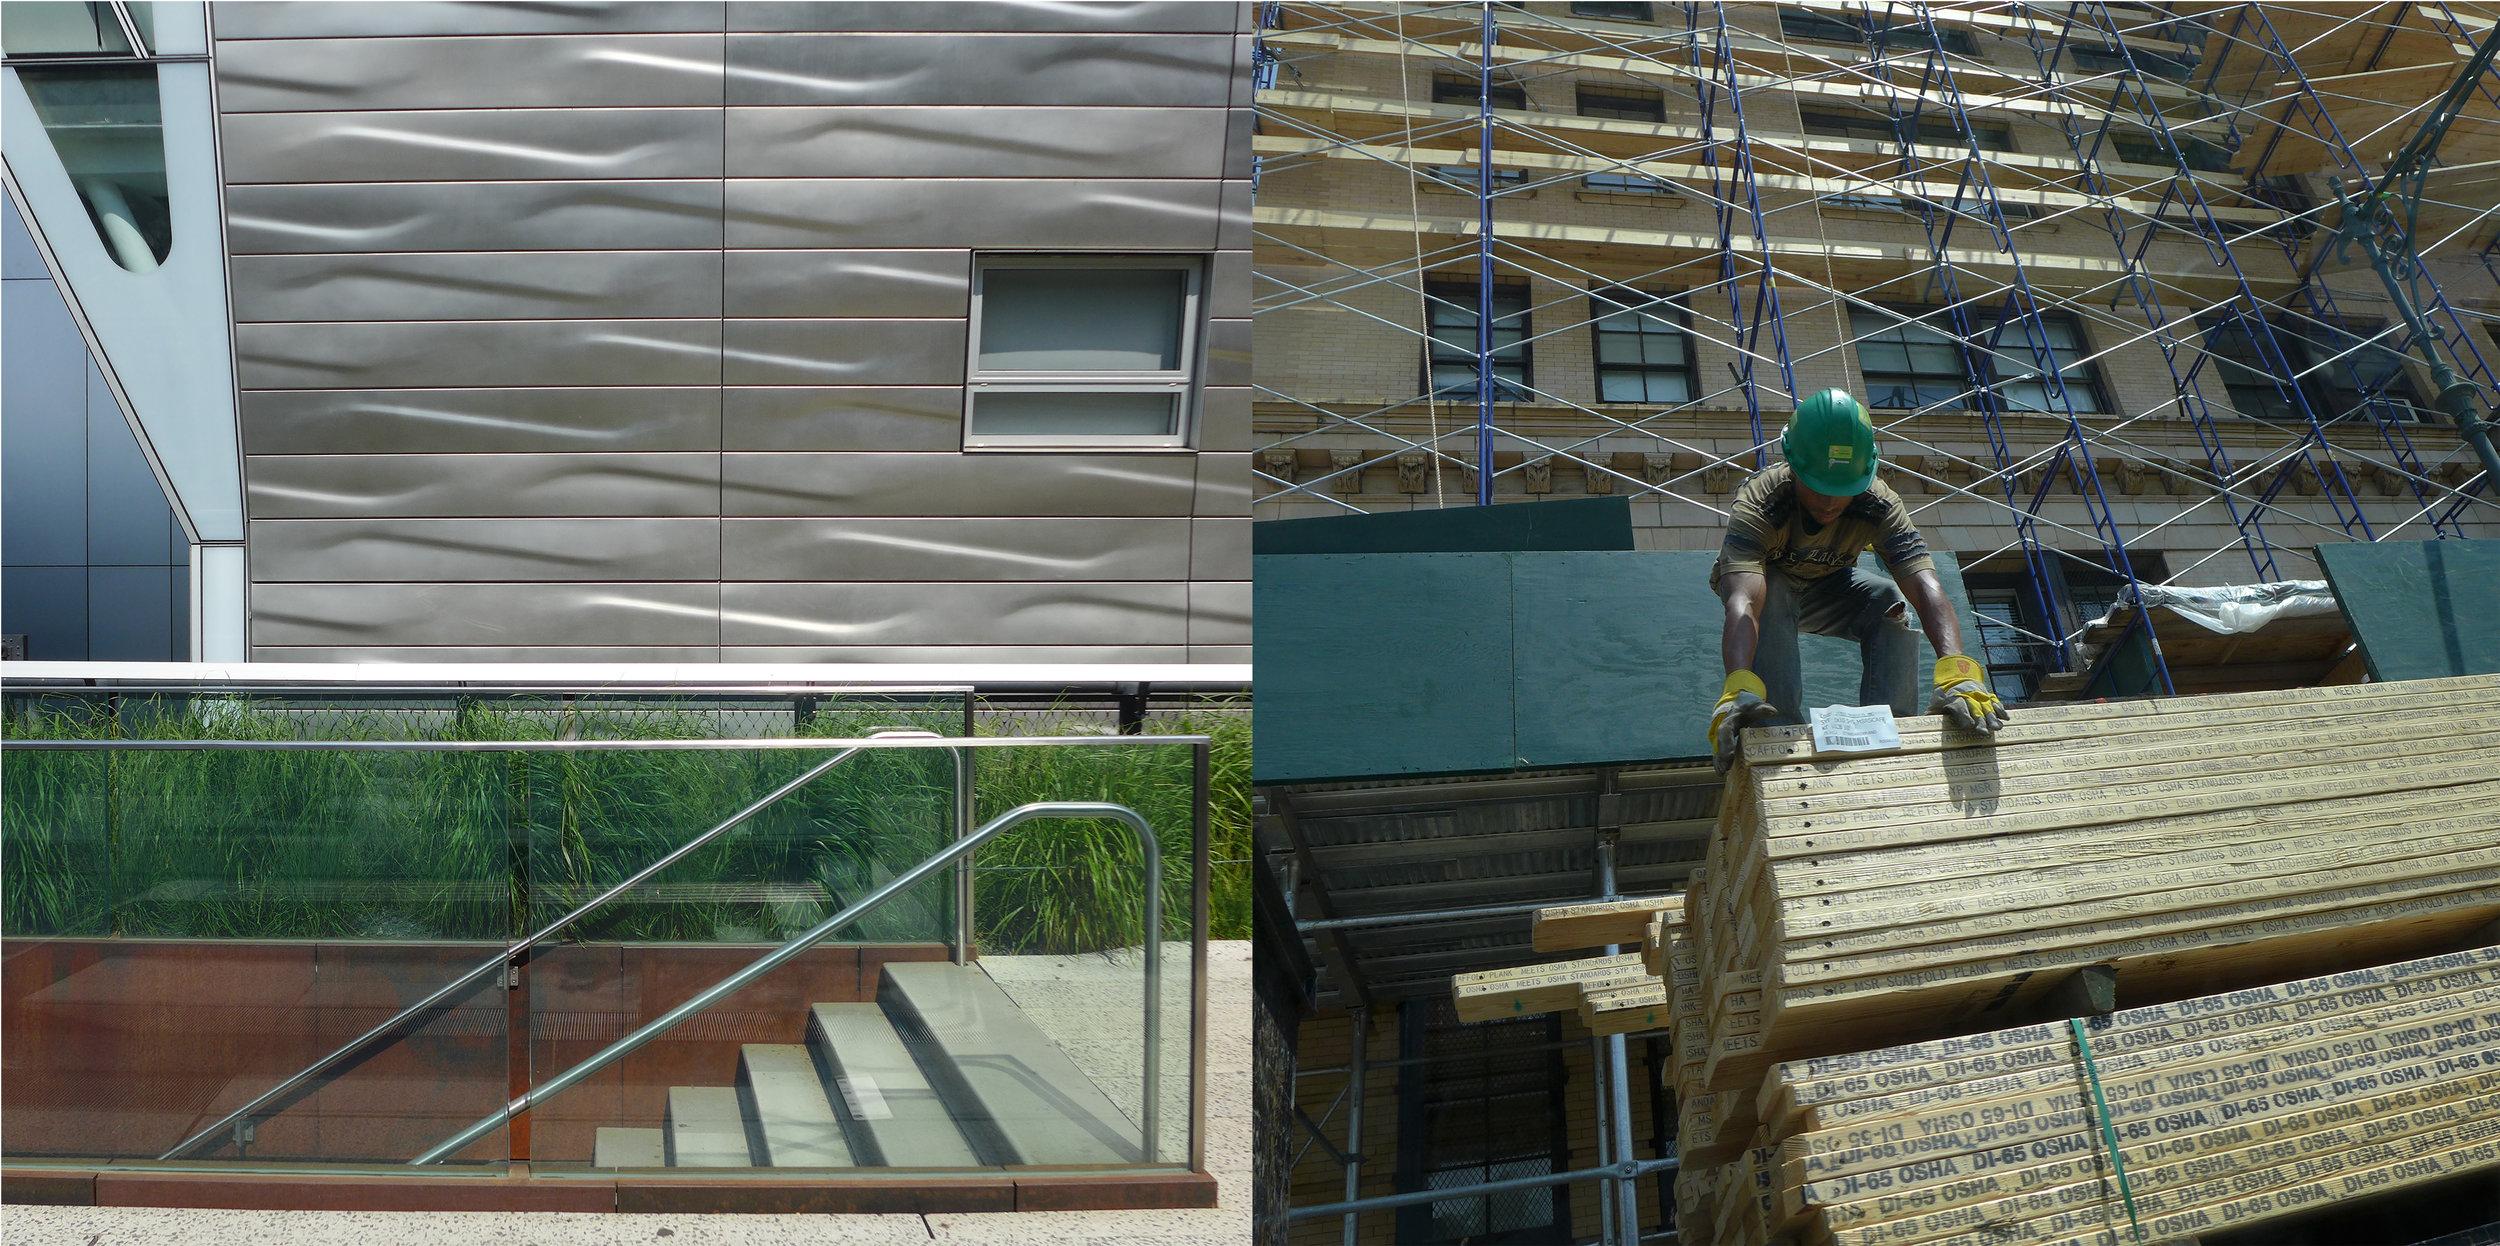 Highline & Construction Worker